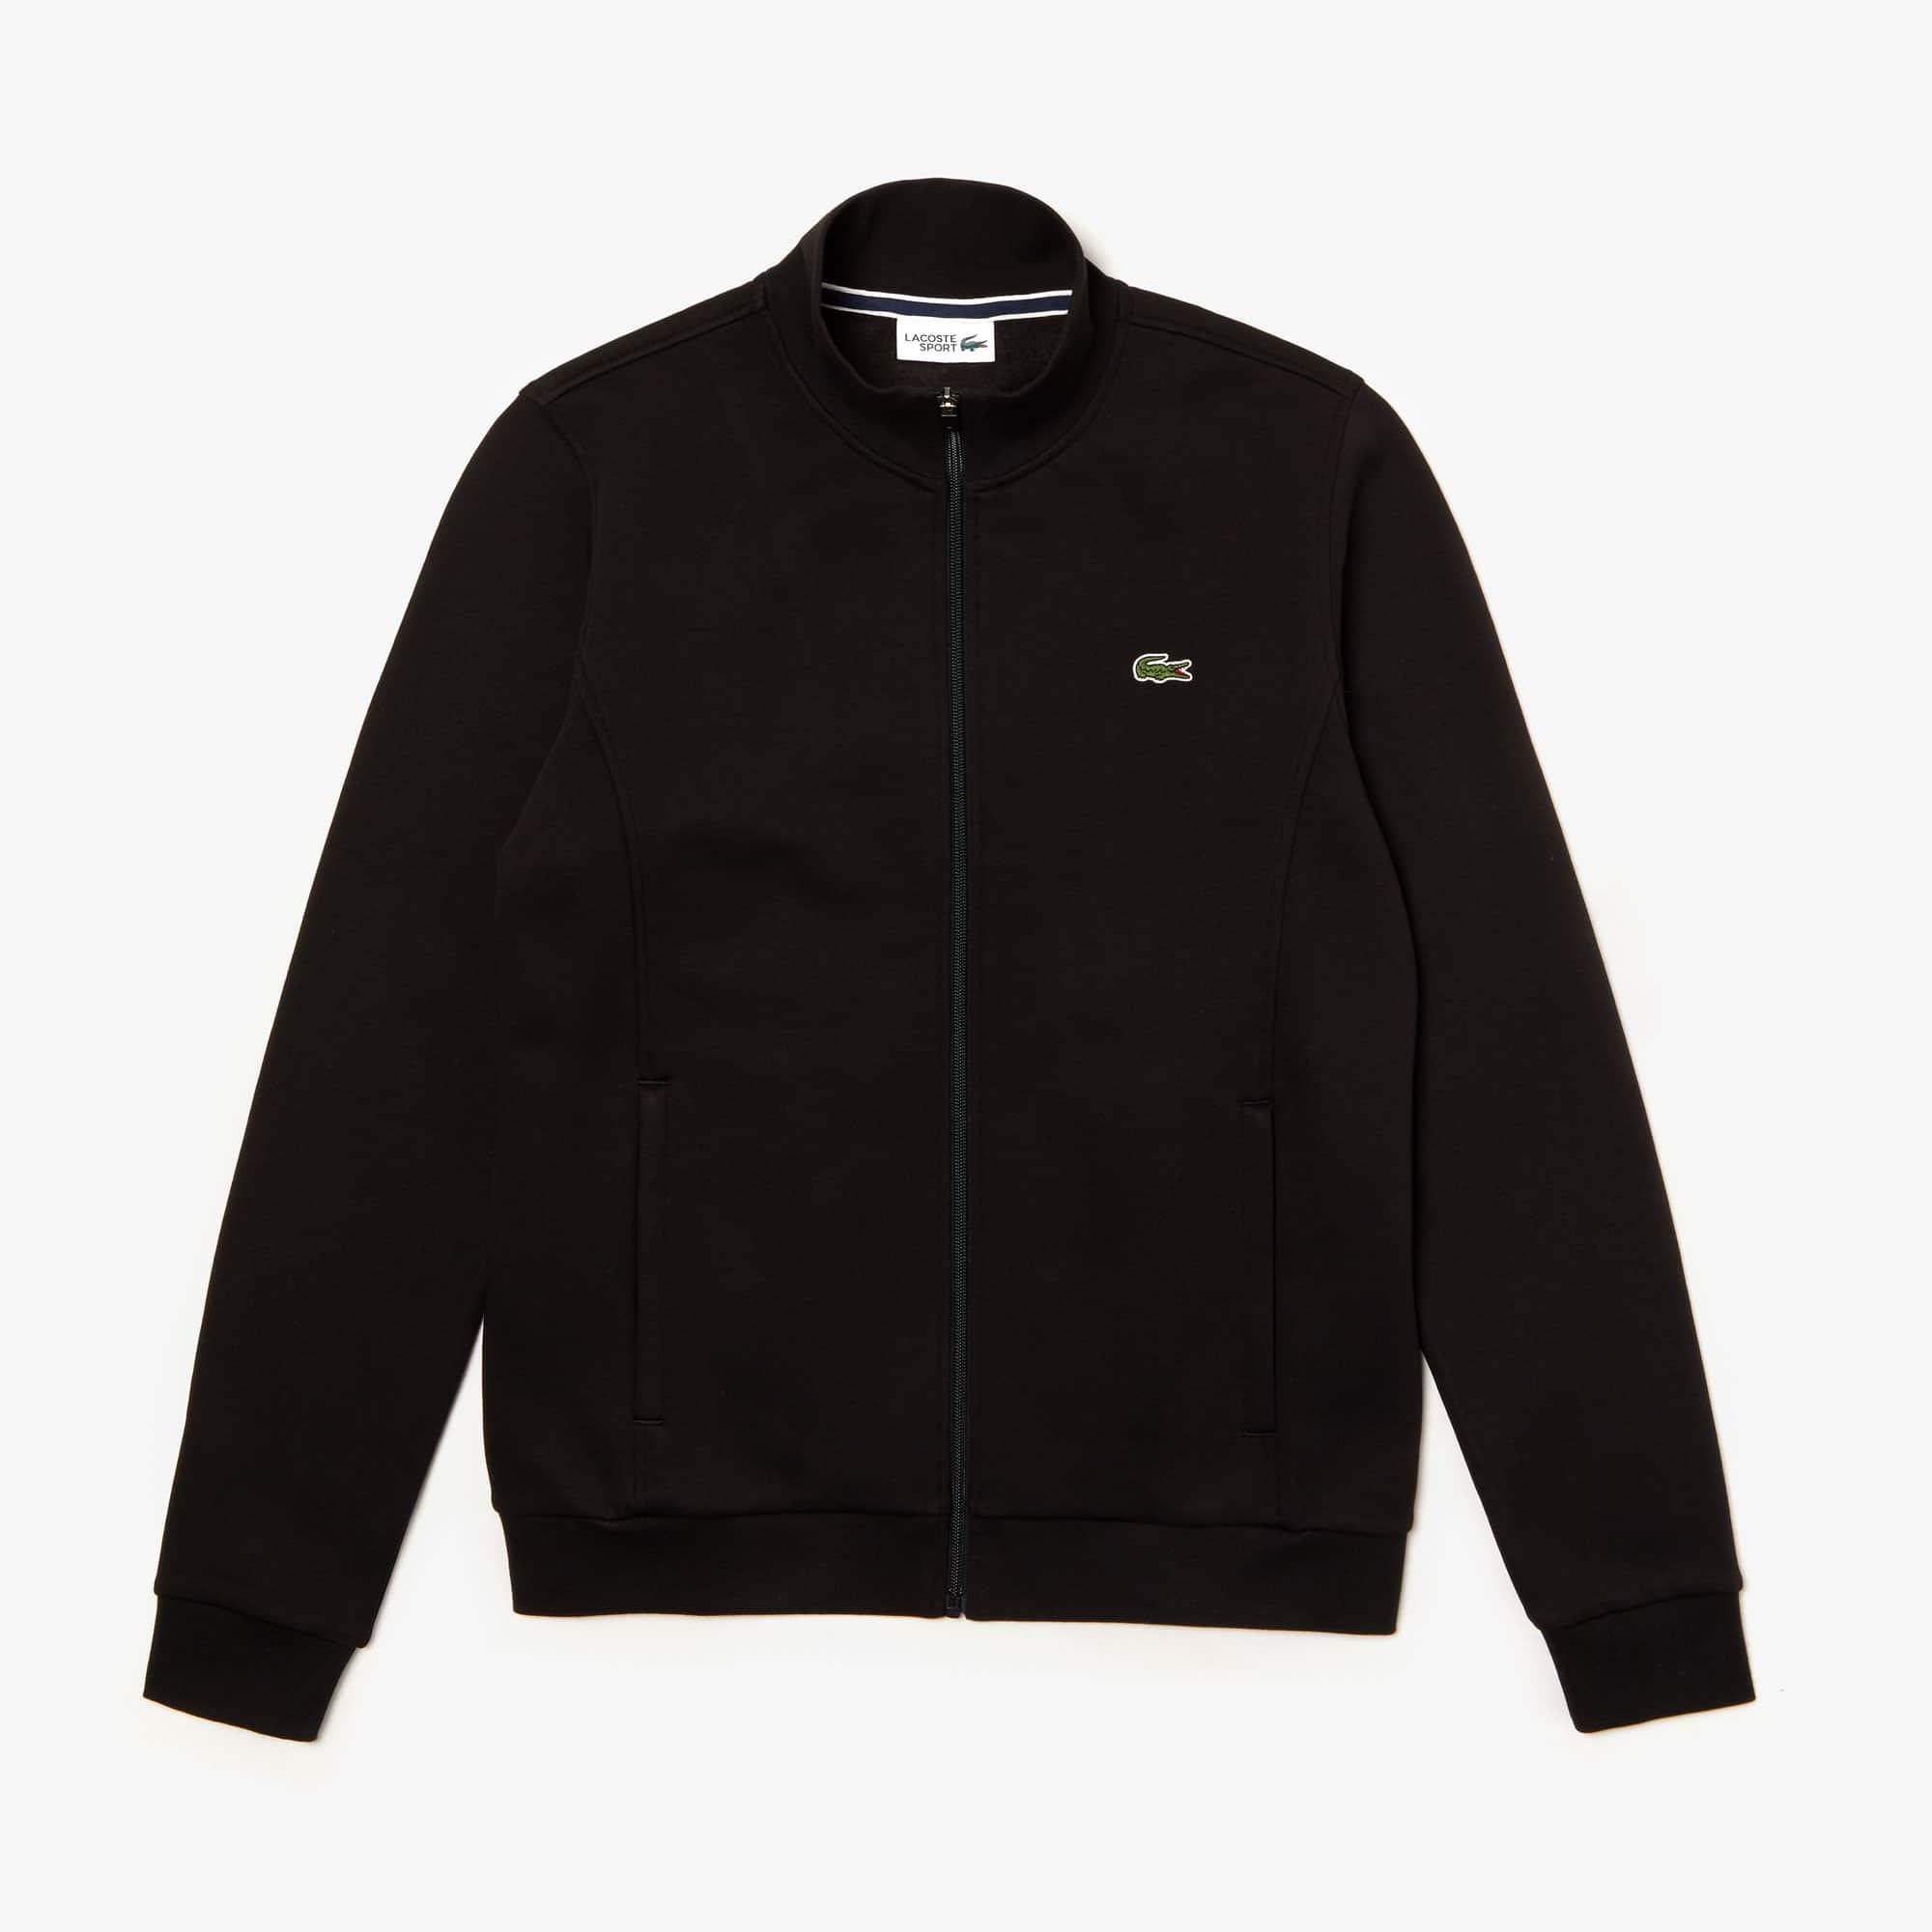 Lacoste SPORT molton sweater met rits